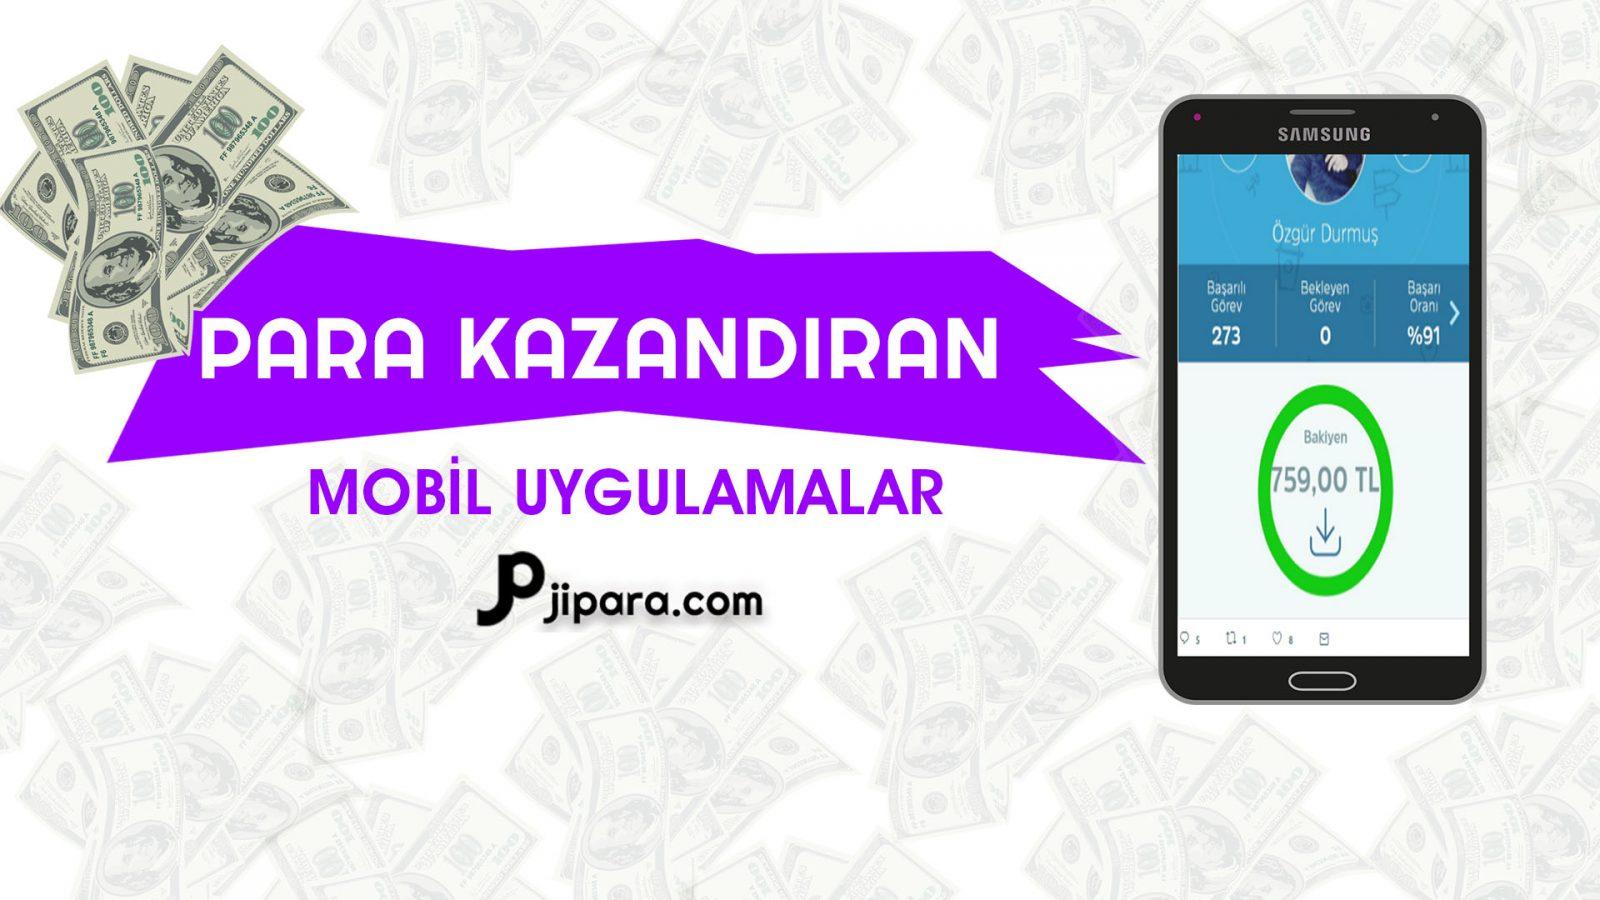 Telefondan Para Kazandıran Mobil Uygulamalar